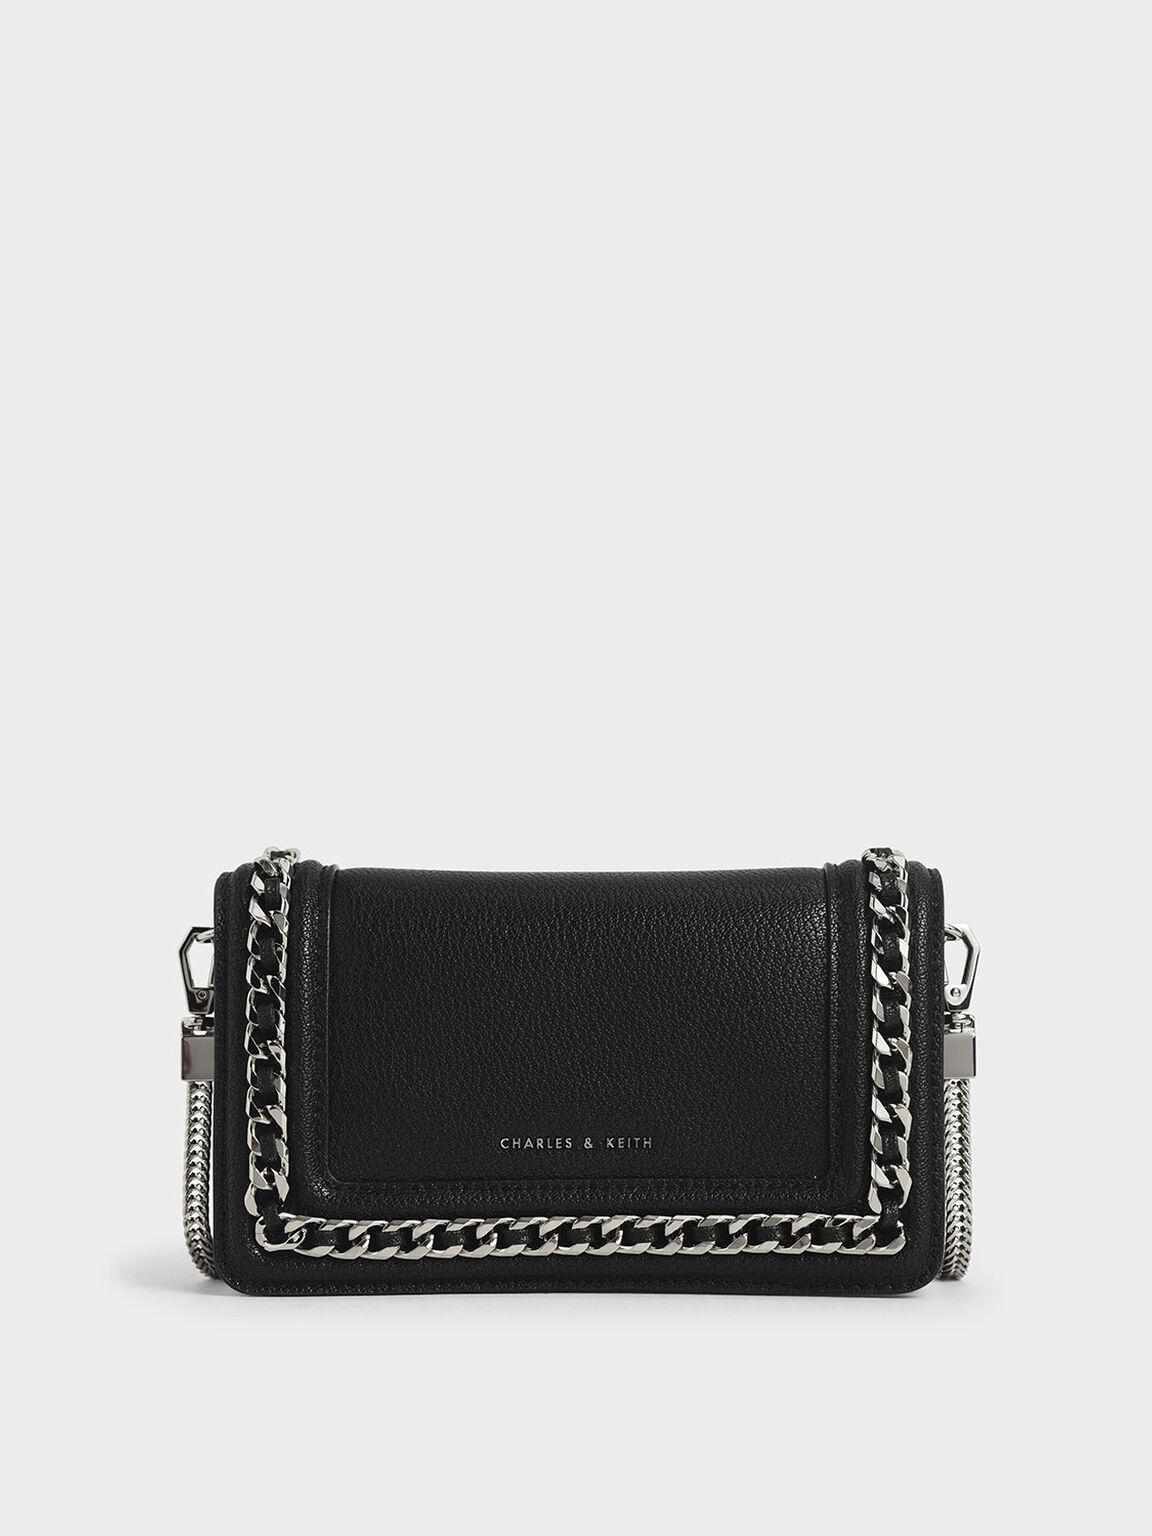 Chain-Trimmed Clutch, Black, hi-res